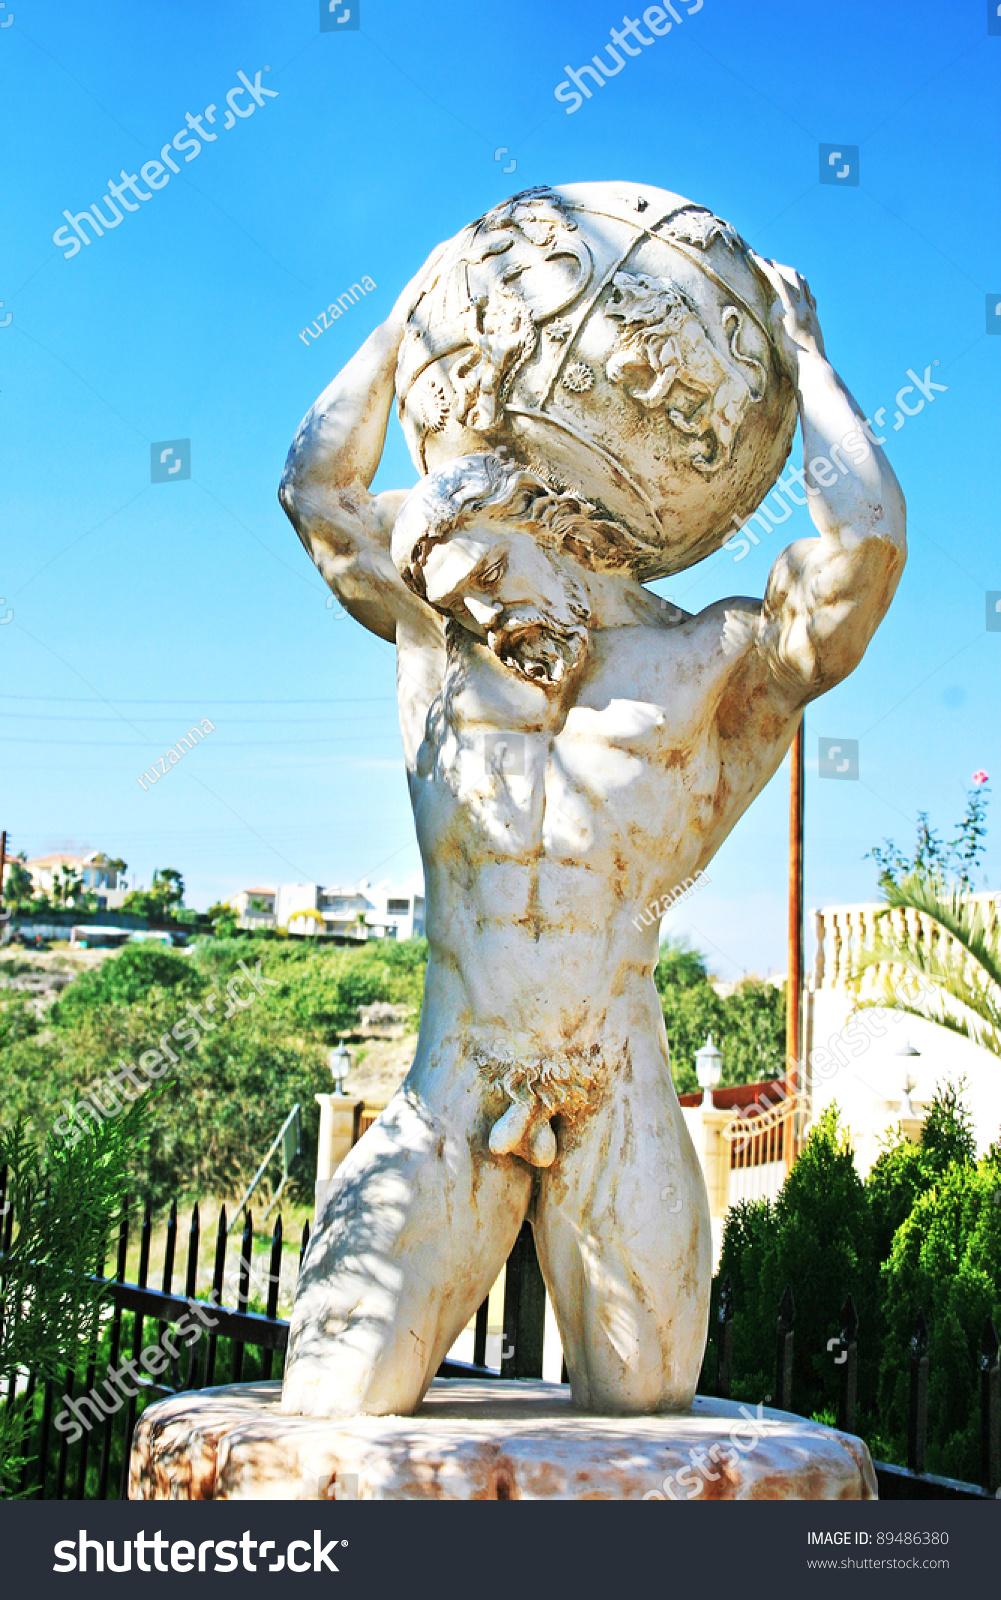 Garden Statue Atlas Holding World On Stock Photo 89486380 - Shutterstock-3525